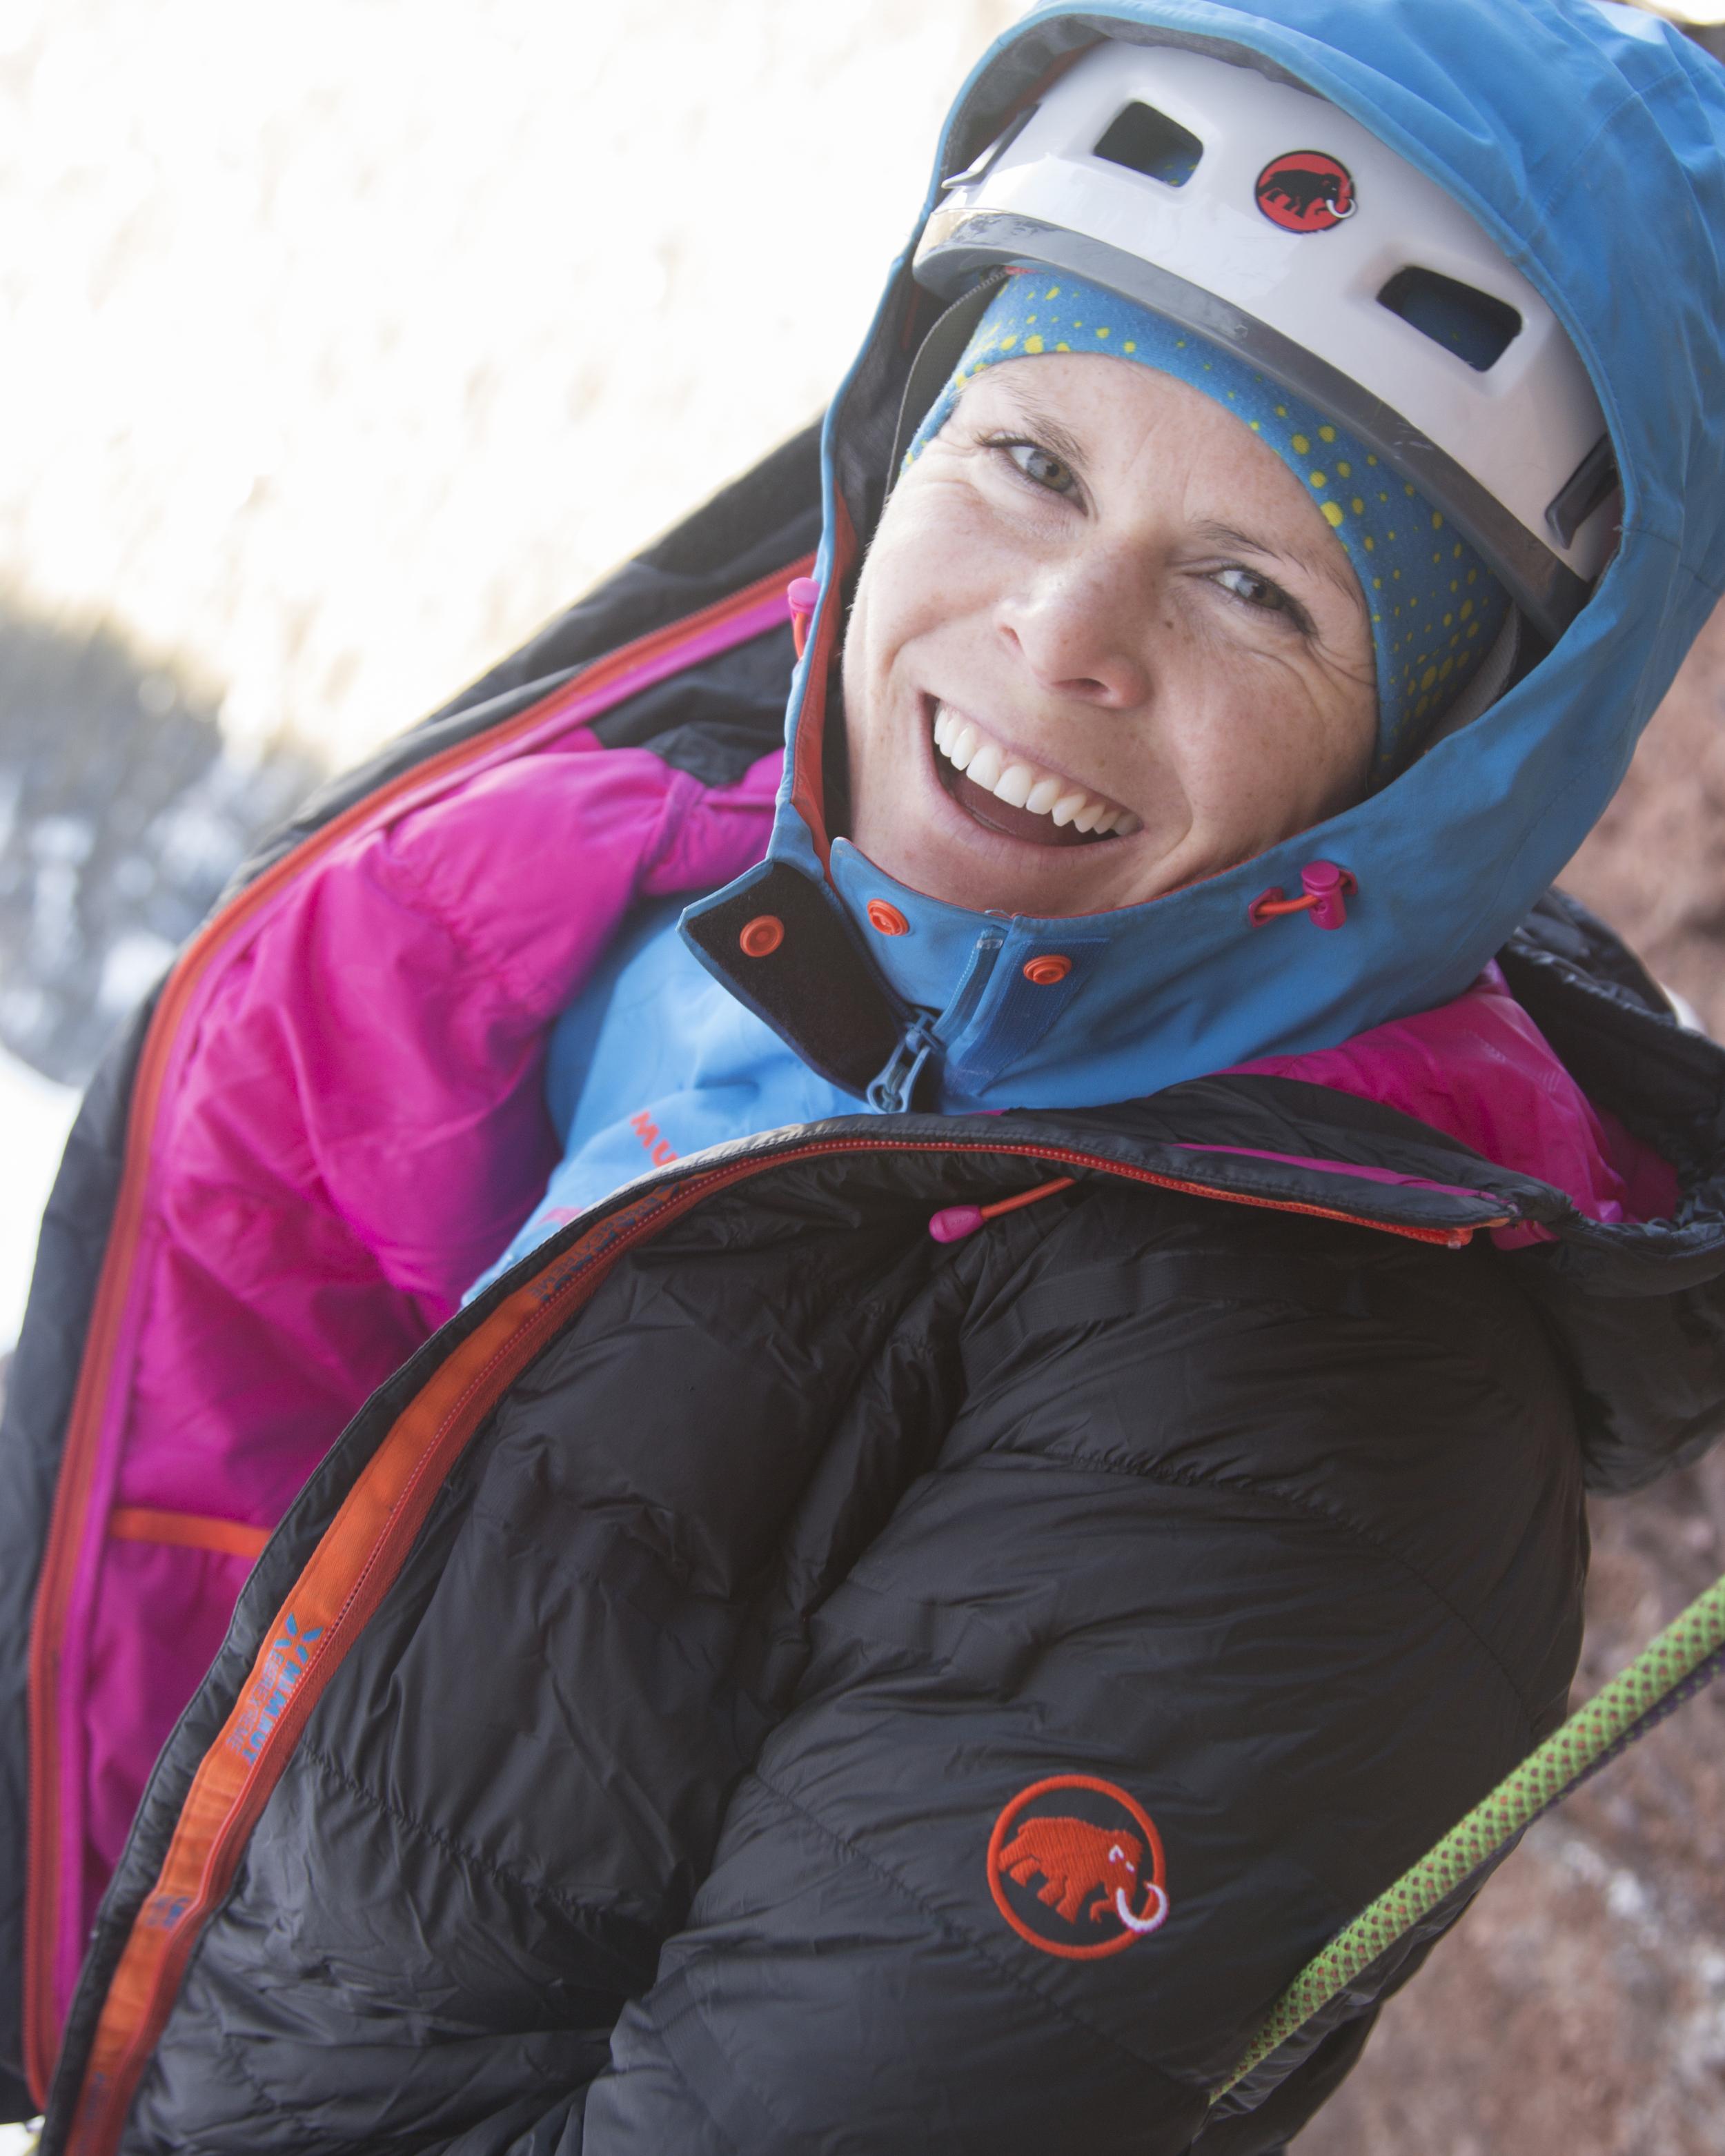 Having fun ice climbing! Photo: David Moskowitz